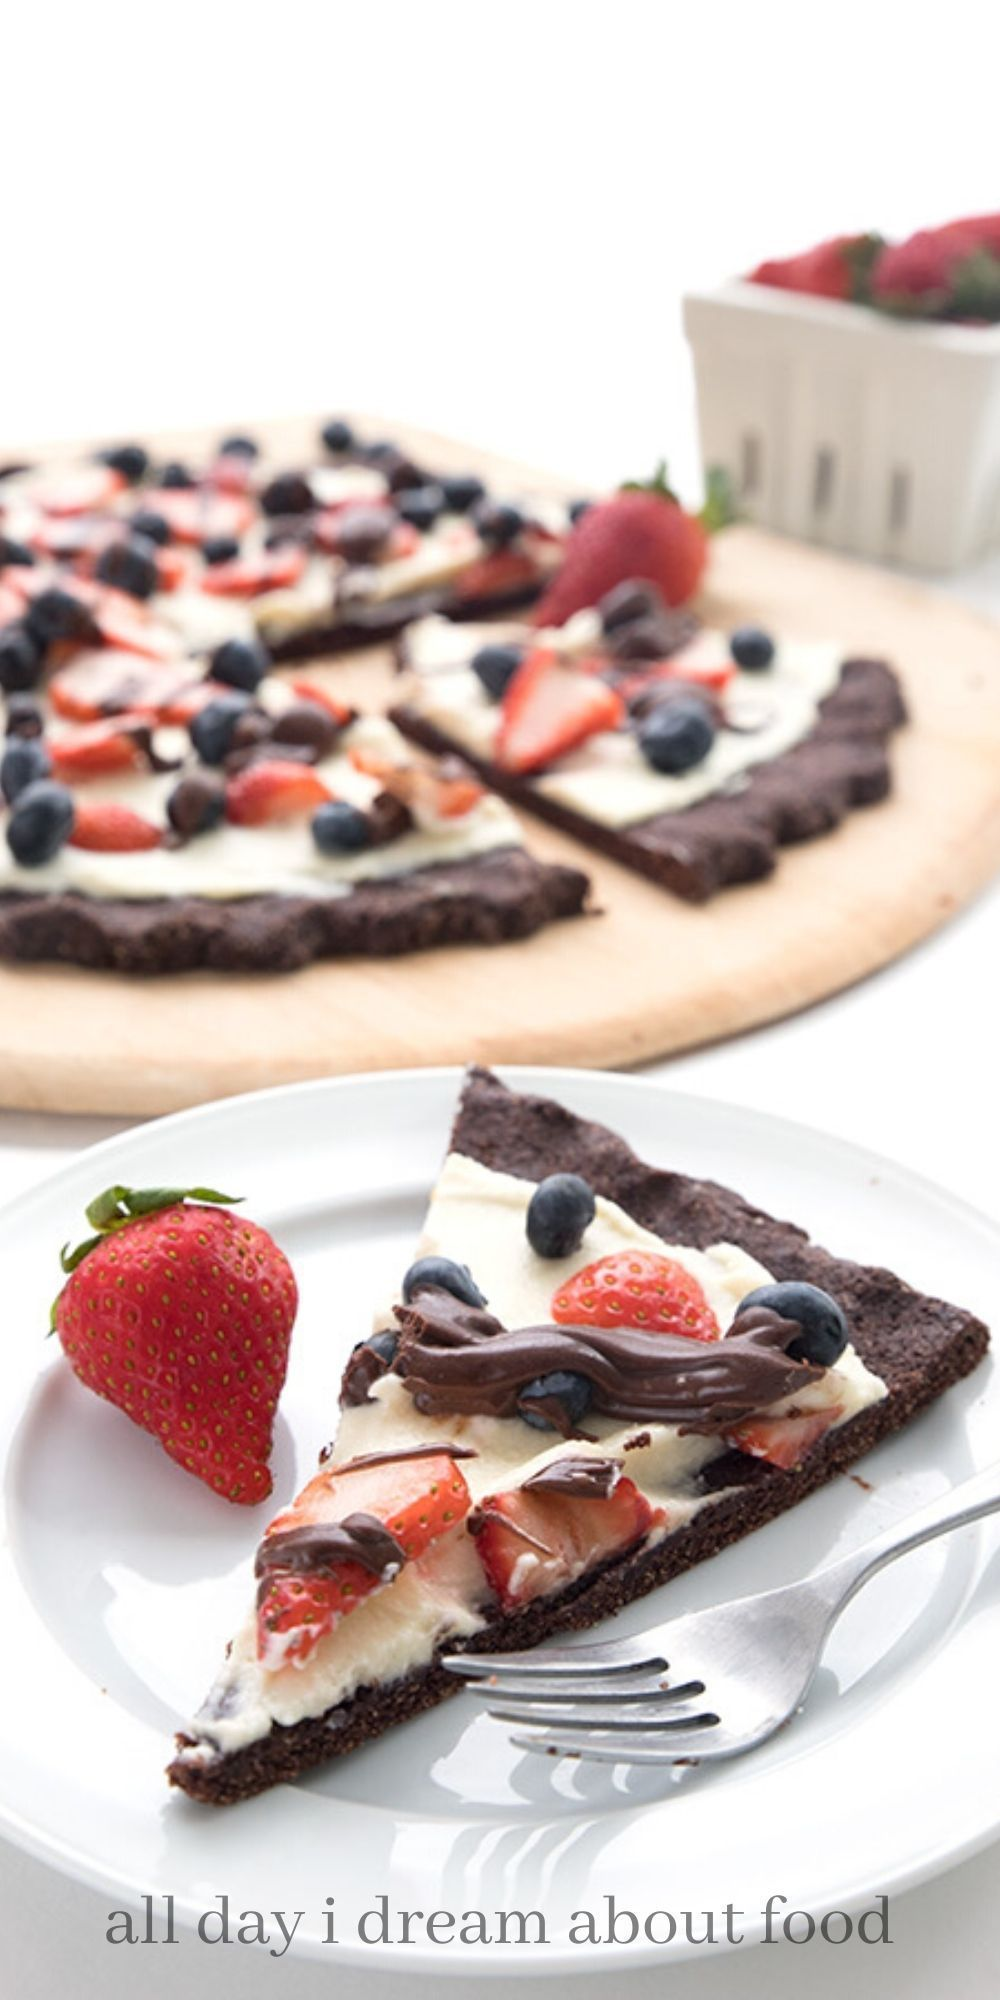 Keto Cookie Pizza Tender chocolate almond flour cr